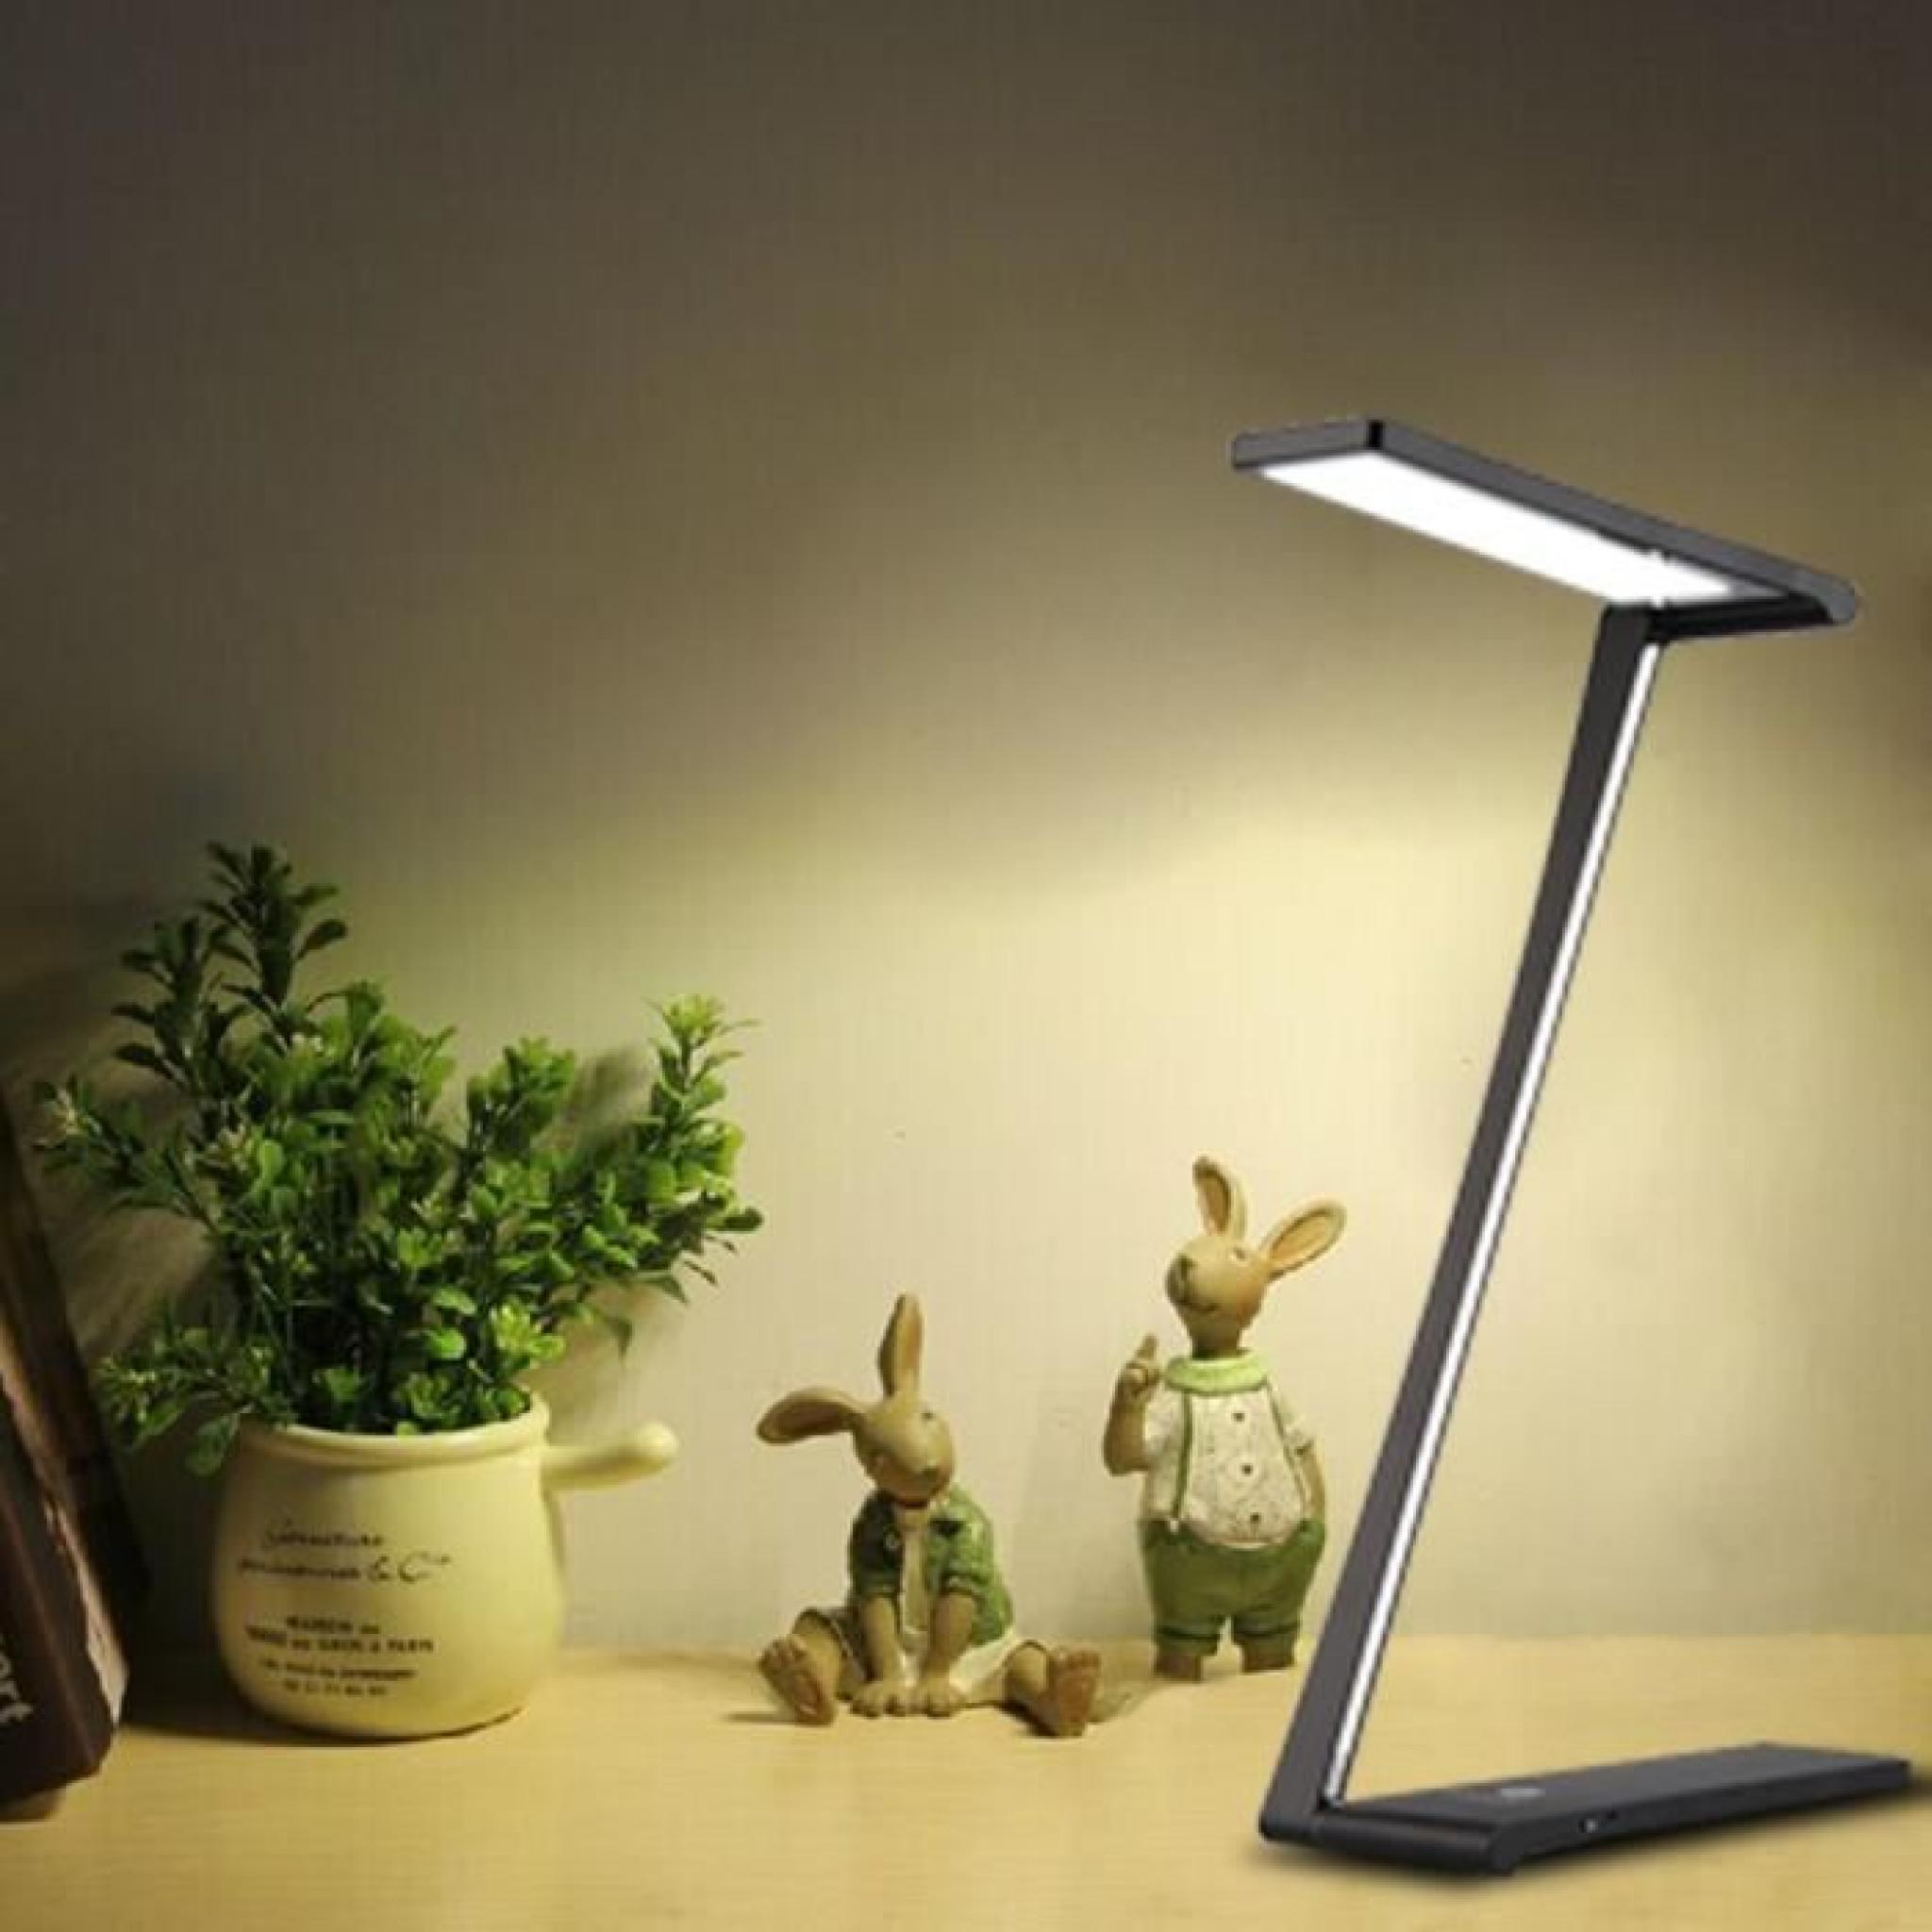 Mince Table 6w Lampe Induction Tactile Chargement Rouge De Ultra Led Usb Pliable Moderne Floureon Samsung 0kPwnO